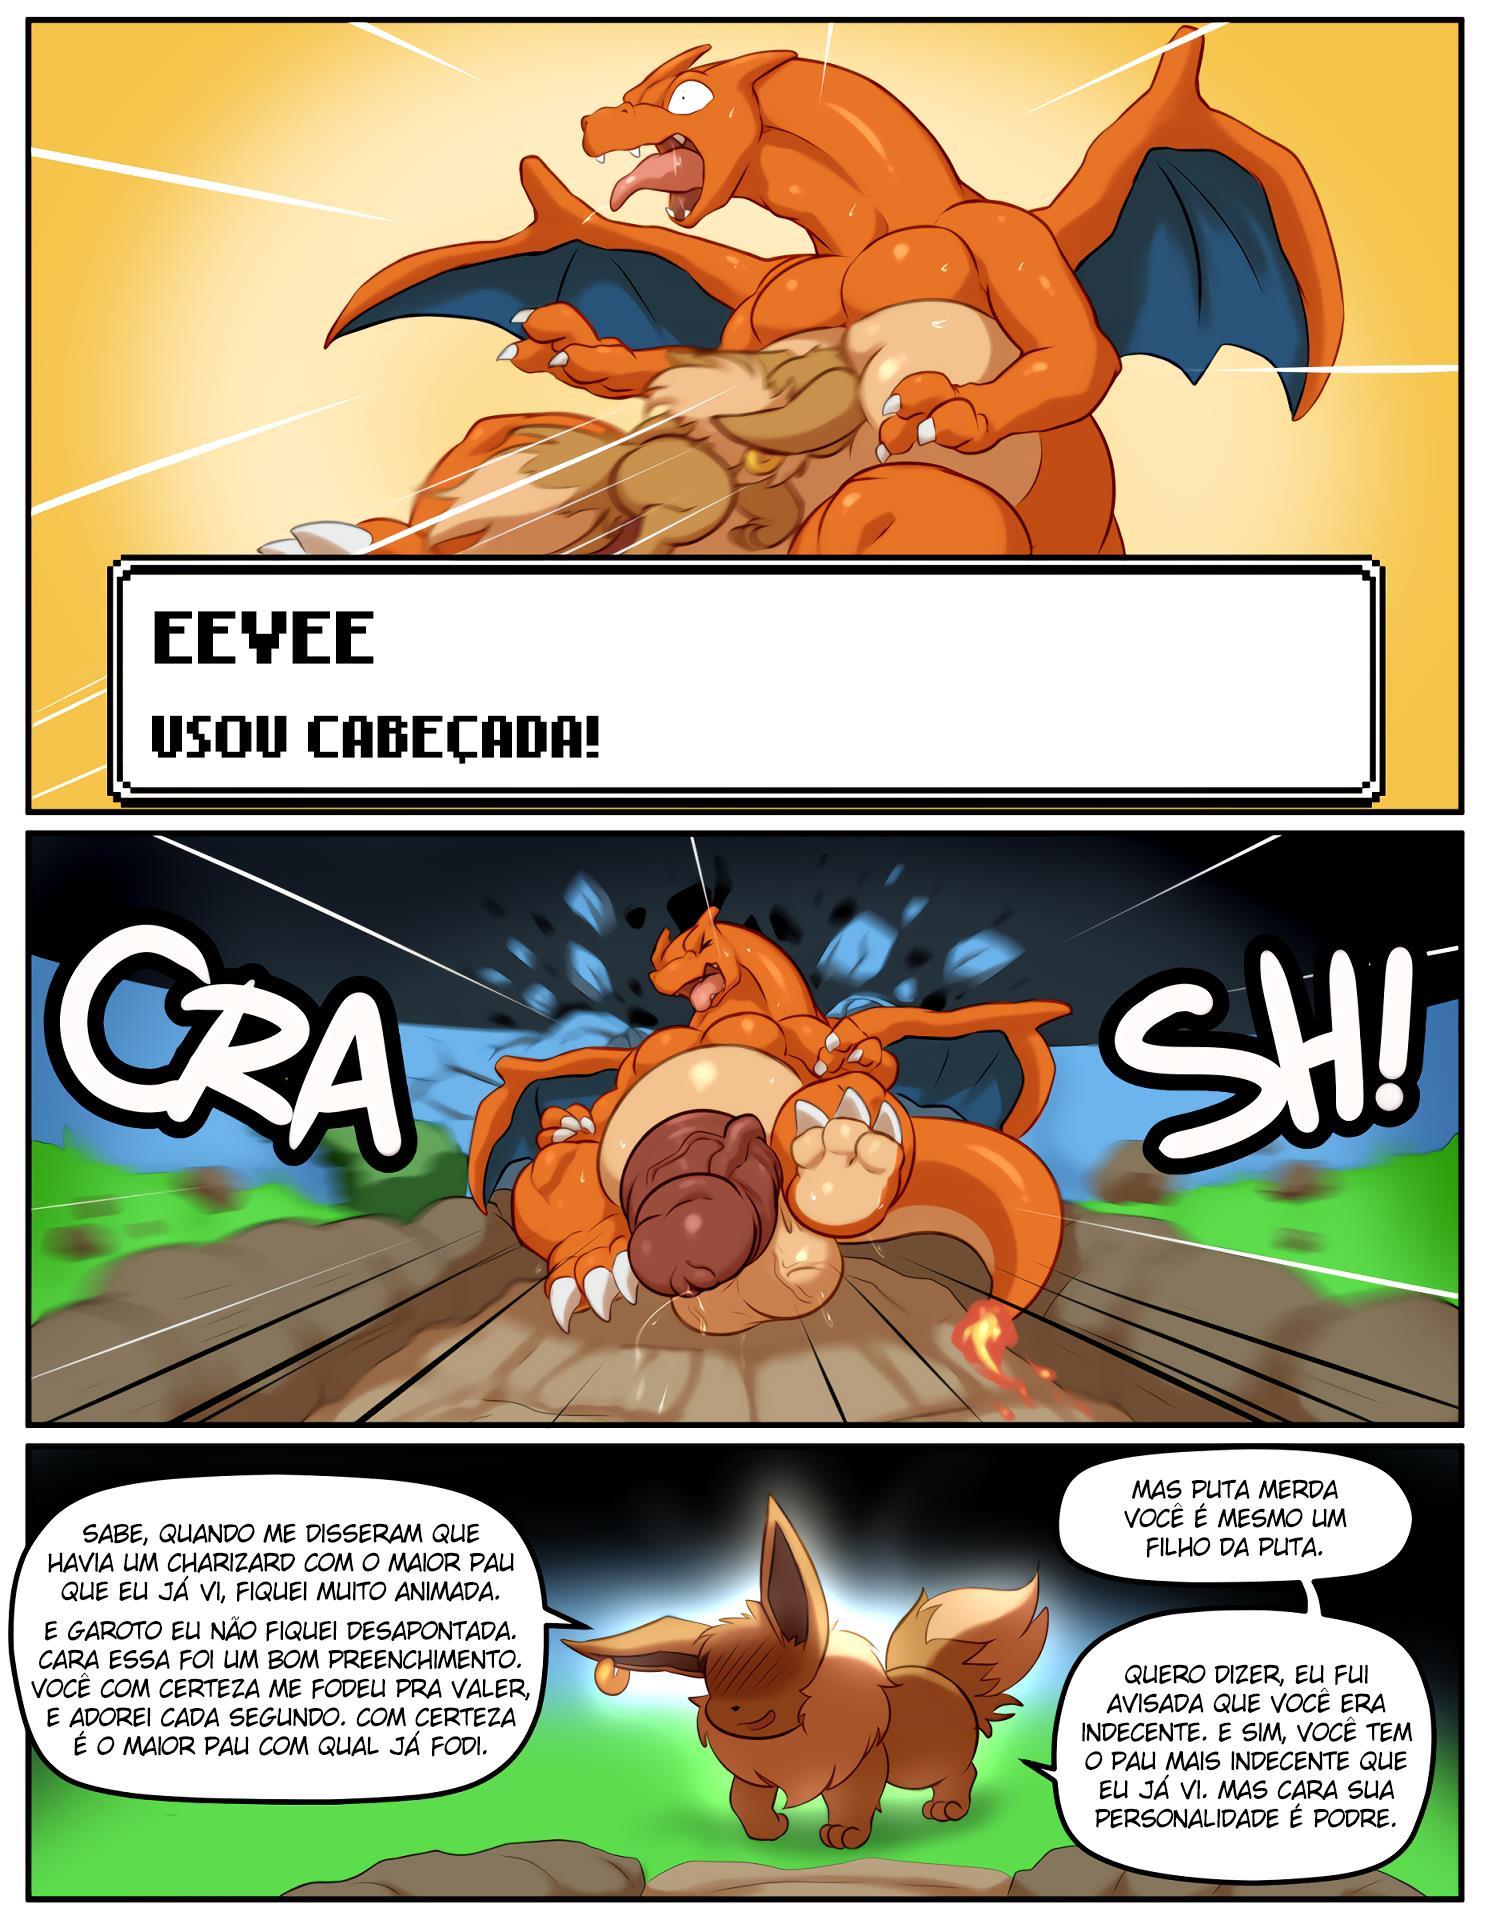 Pokémon Pornô – Charizard fodendo